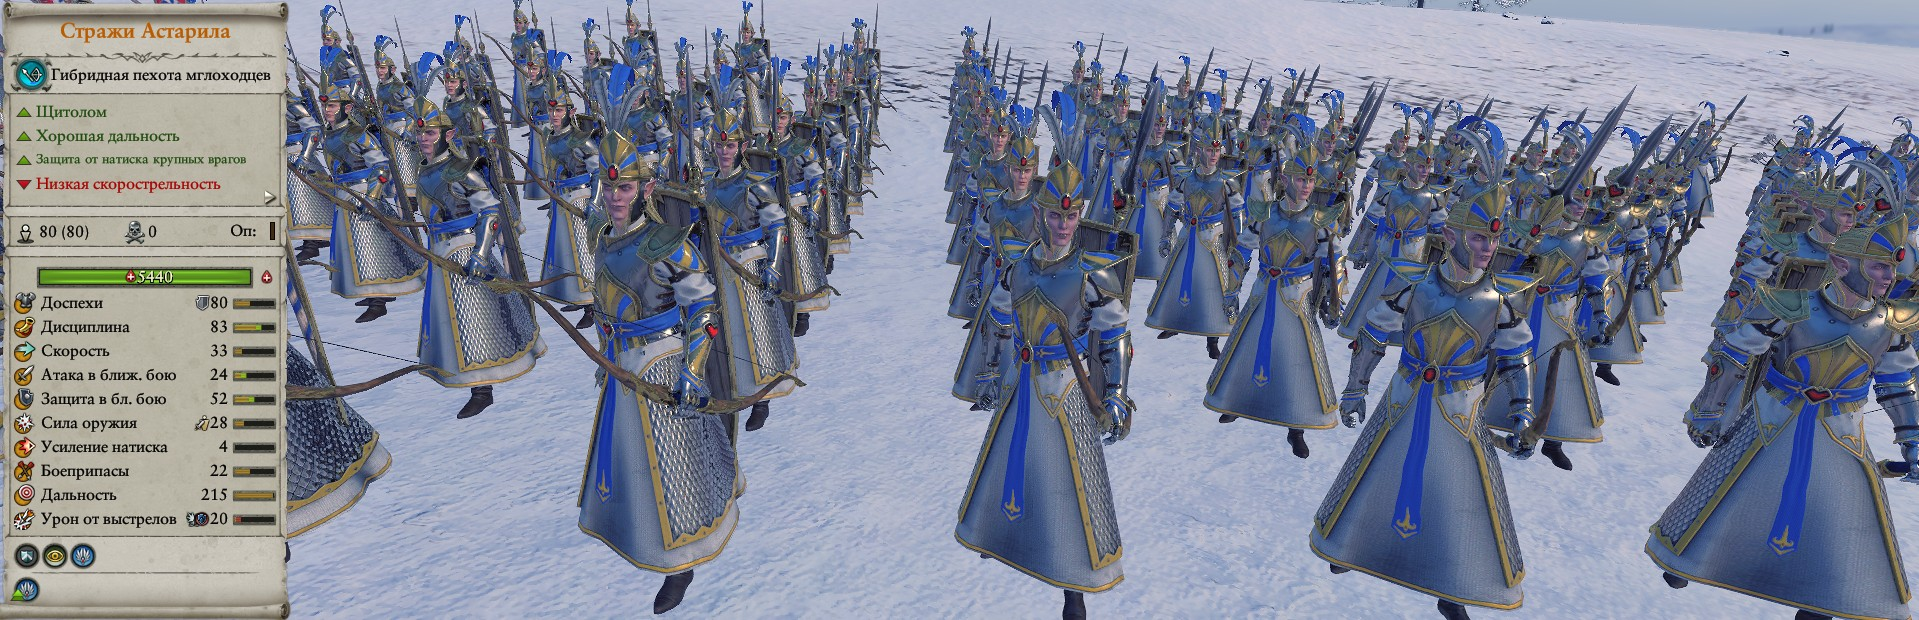 Стражи Астарила отряд warhammer